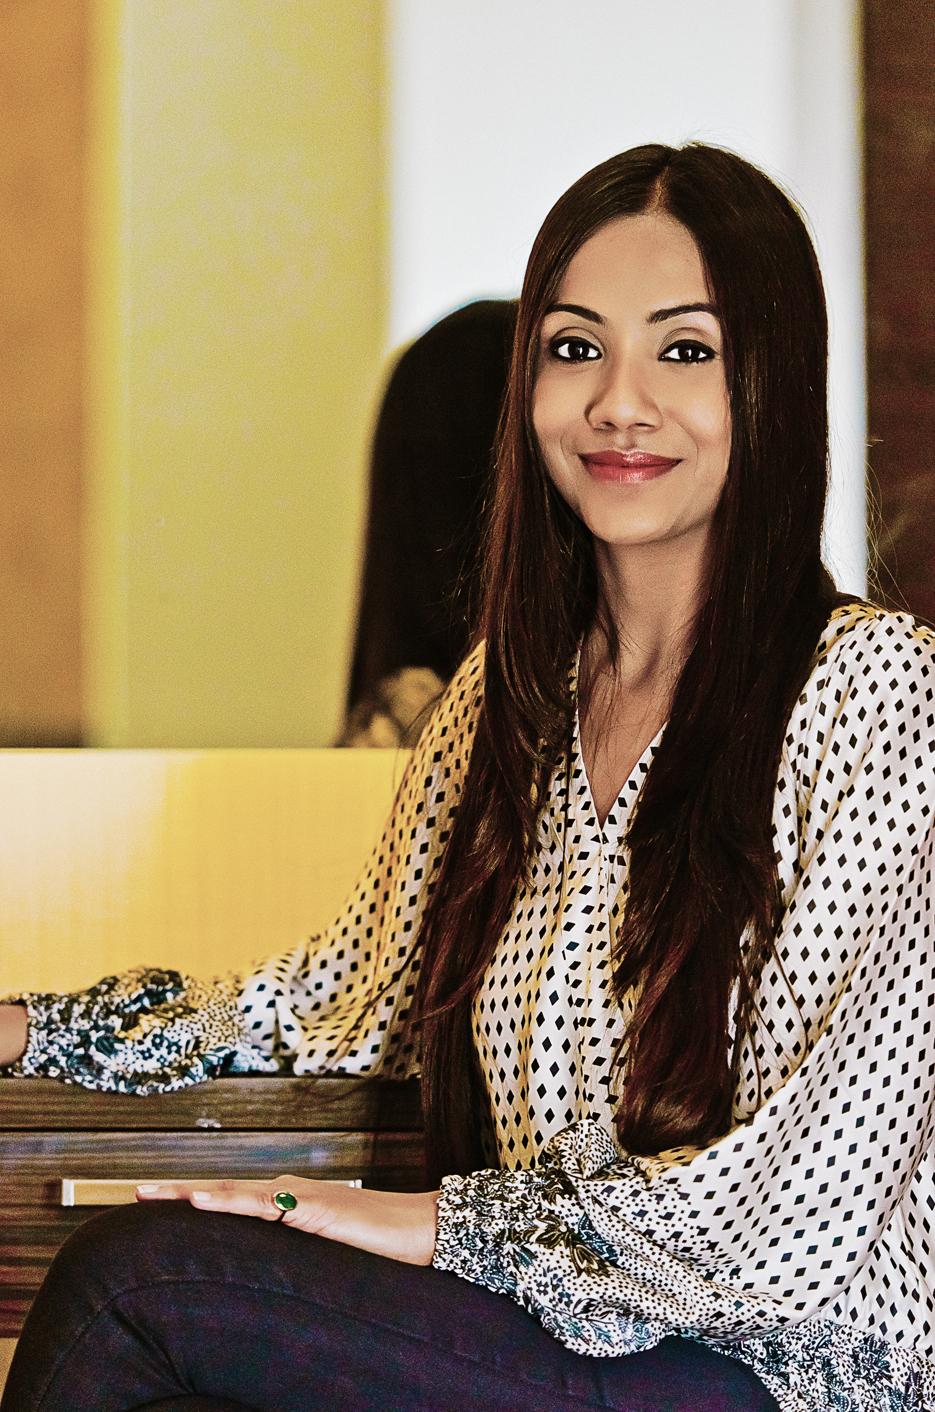 Preeti Aggarwal, Jewelry designer. Photography by professional Indian lifestyle photographer Naina Redhu of Naina.co